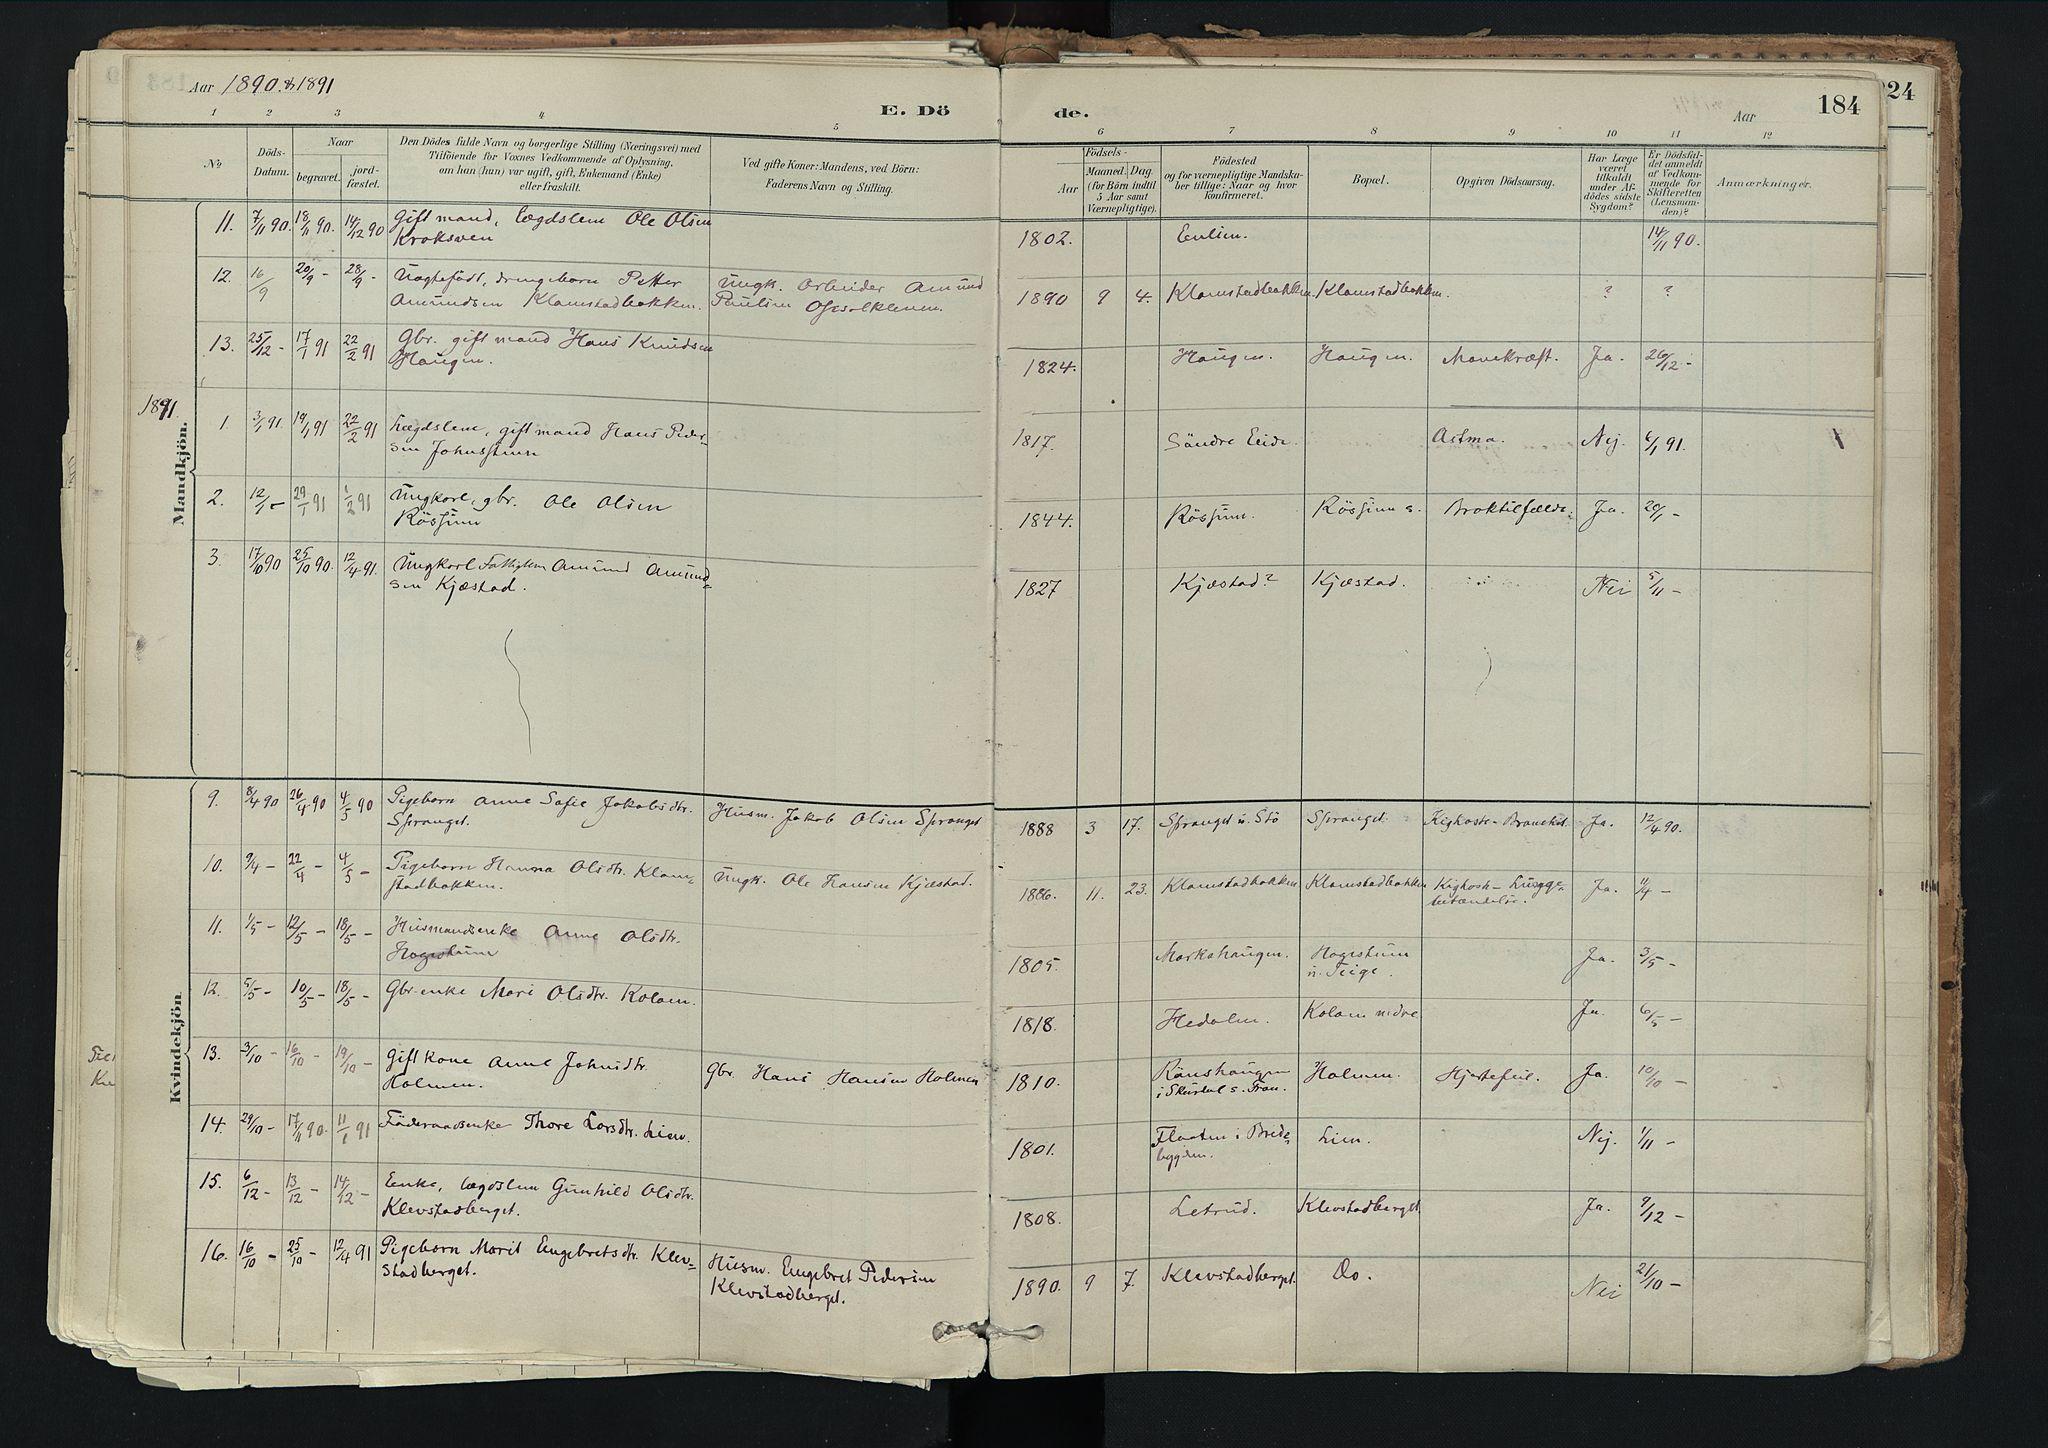 SAH, Nord-Fron prestekontor, Ministerialbok nr. 3, 1884-1914, s. 184